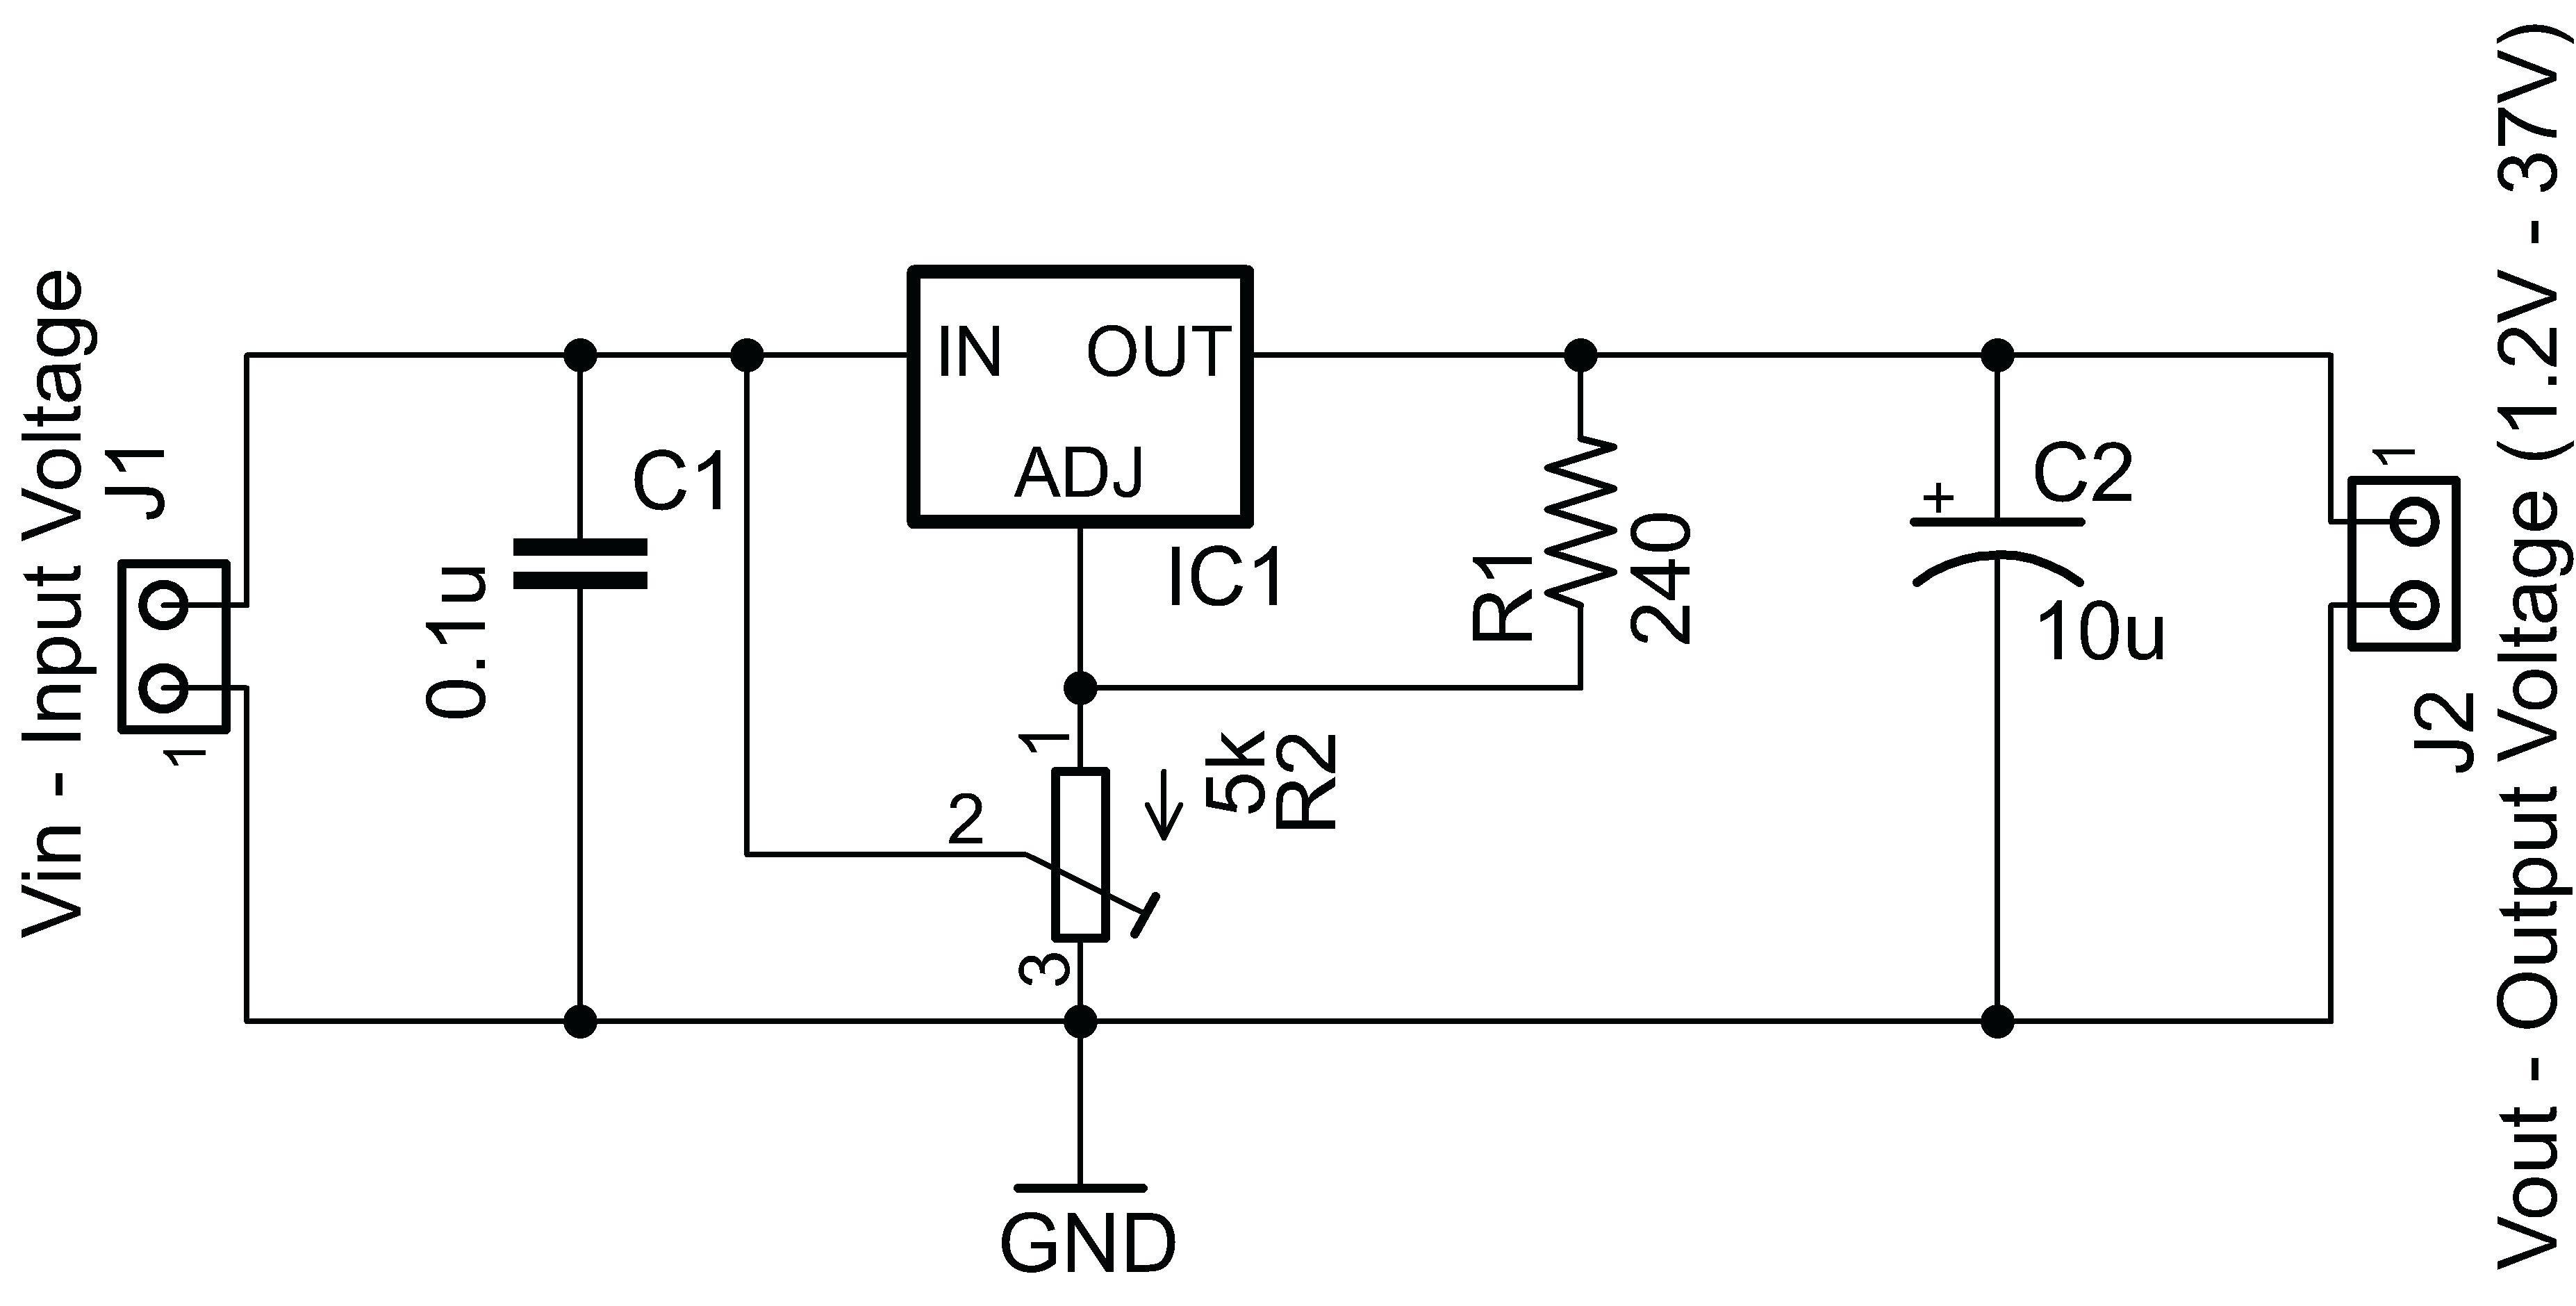 Ford External Voltage Regulator Wiring - All Wiring Diagram - Ford Alternator Wiring Diagram Internal Regulator